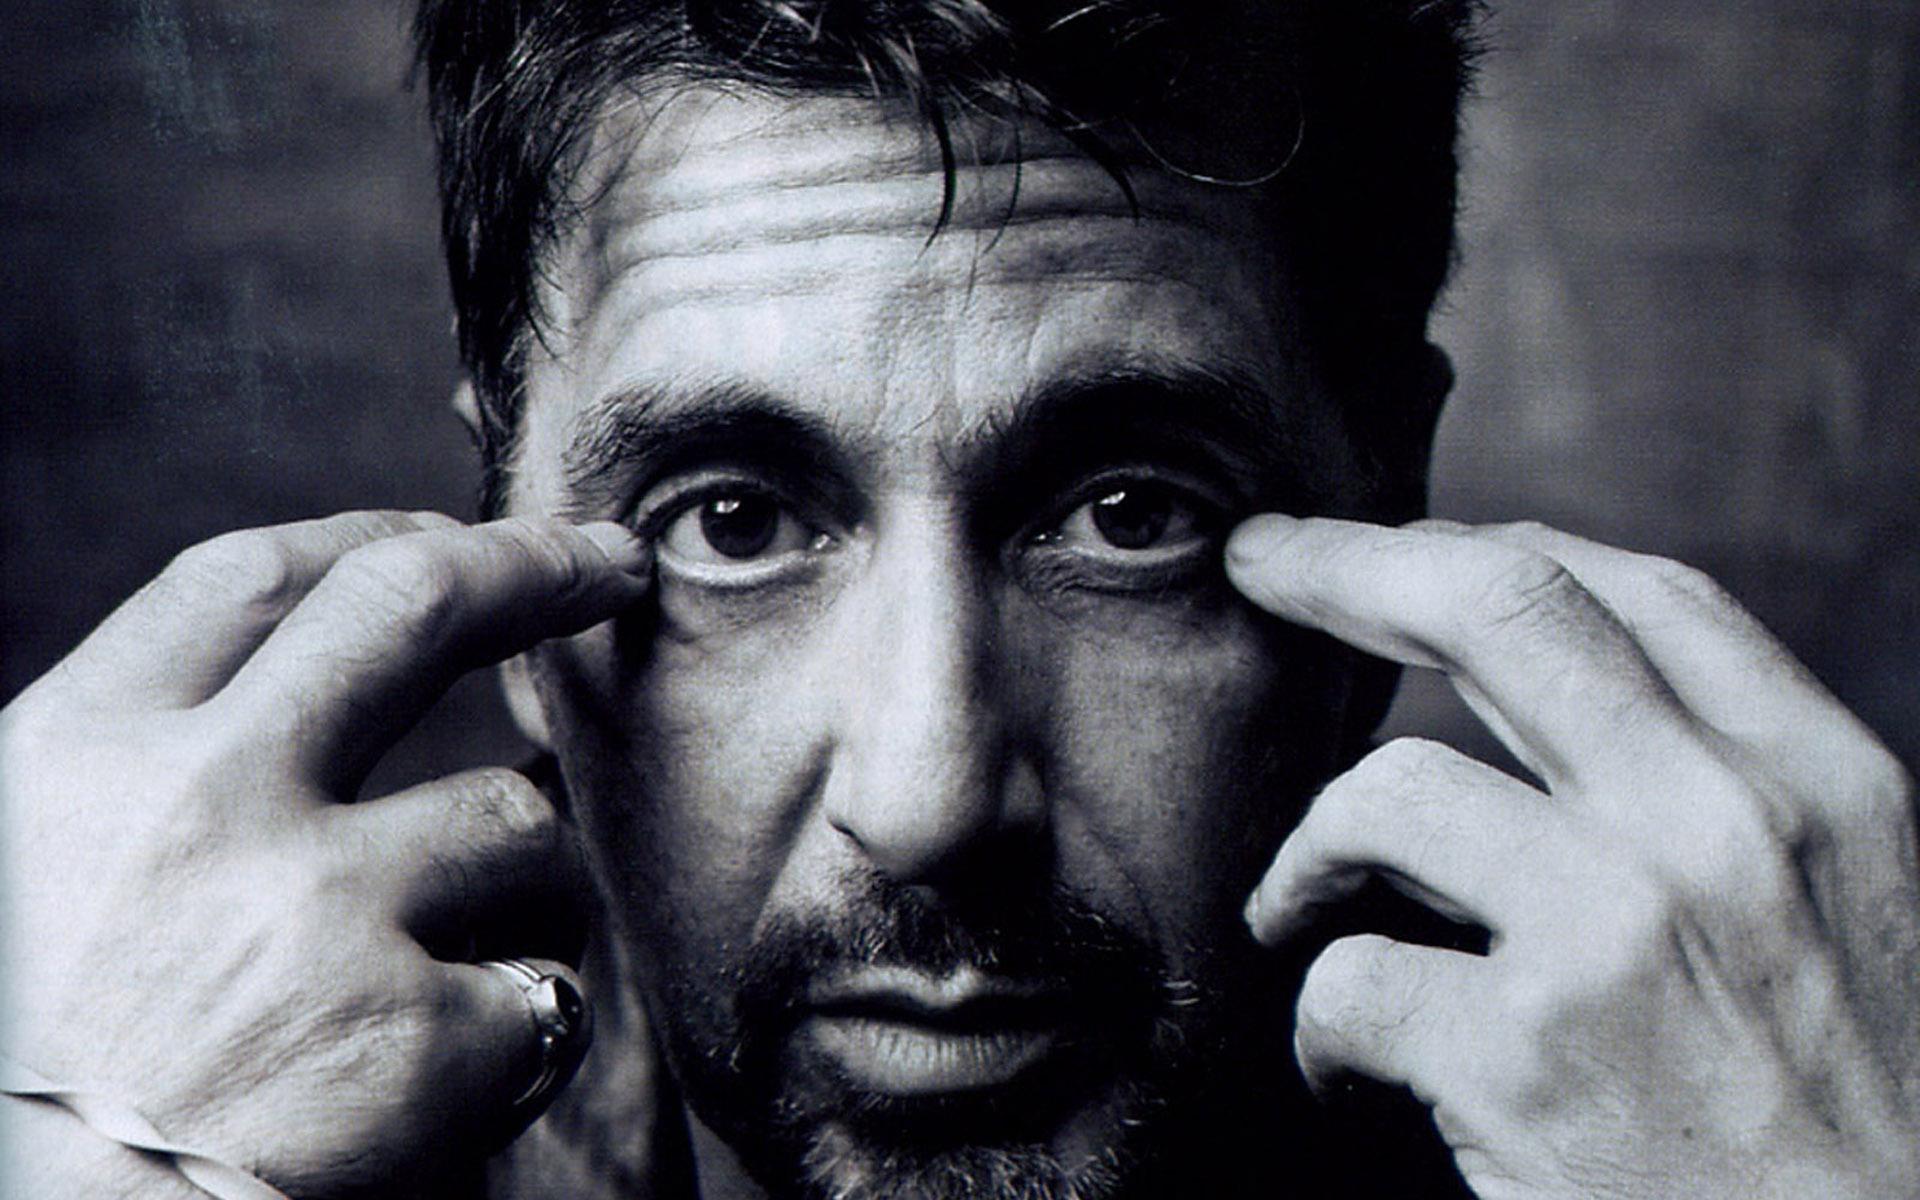 Al Pacino - Al Pacino Wallpaper 4k - HD Wallpaper